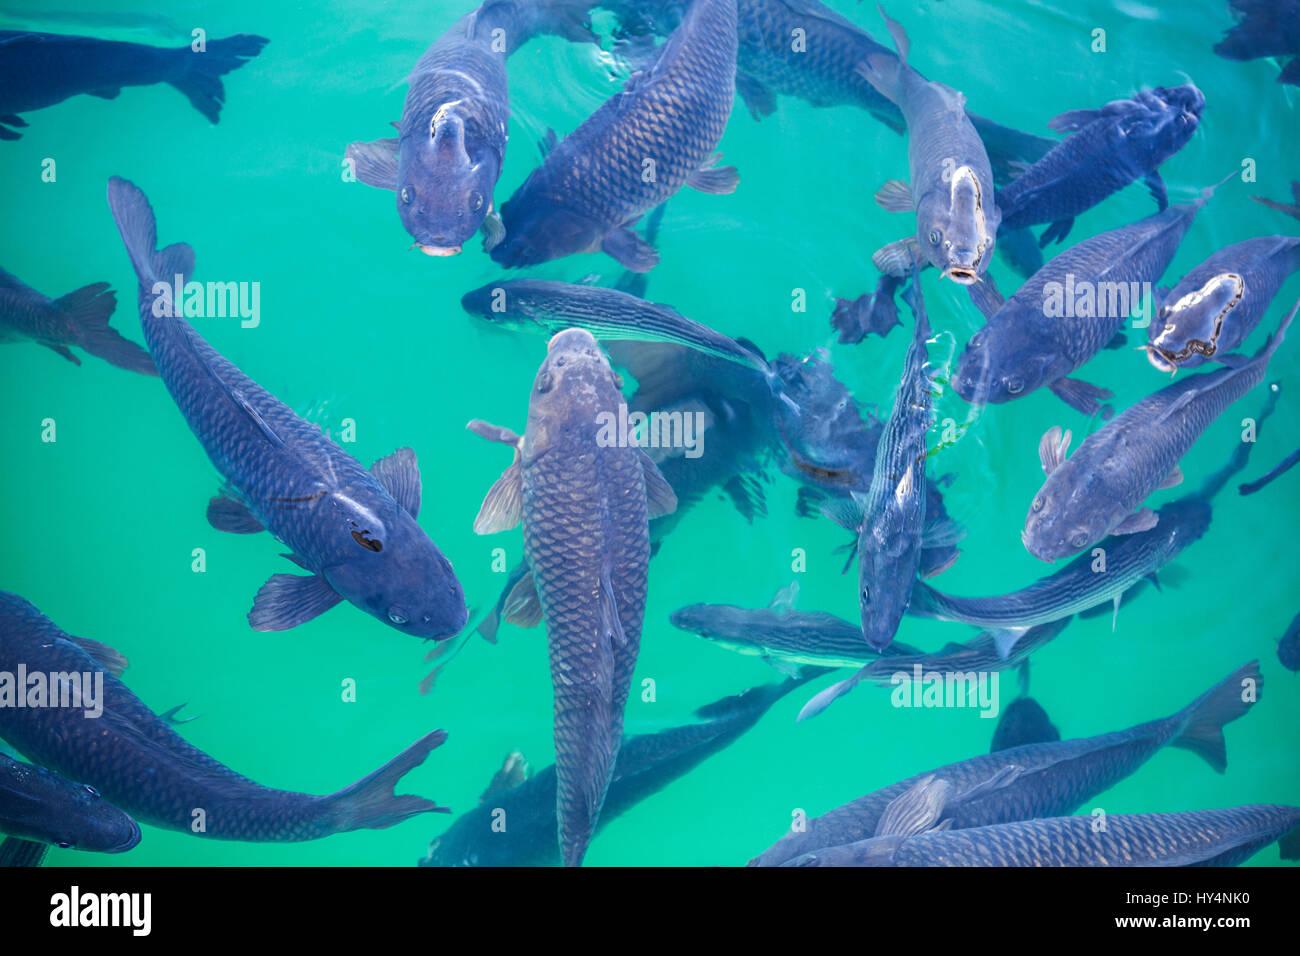 USA, Nevada, Hoover Dam, Lake Mead, fish, carp Stock Photo